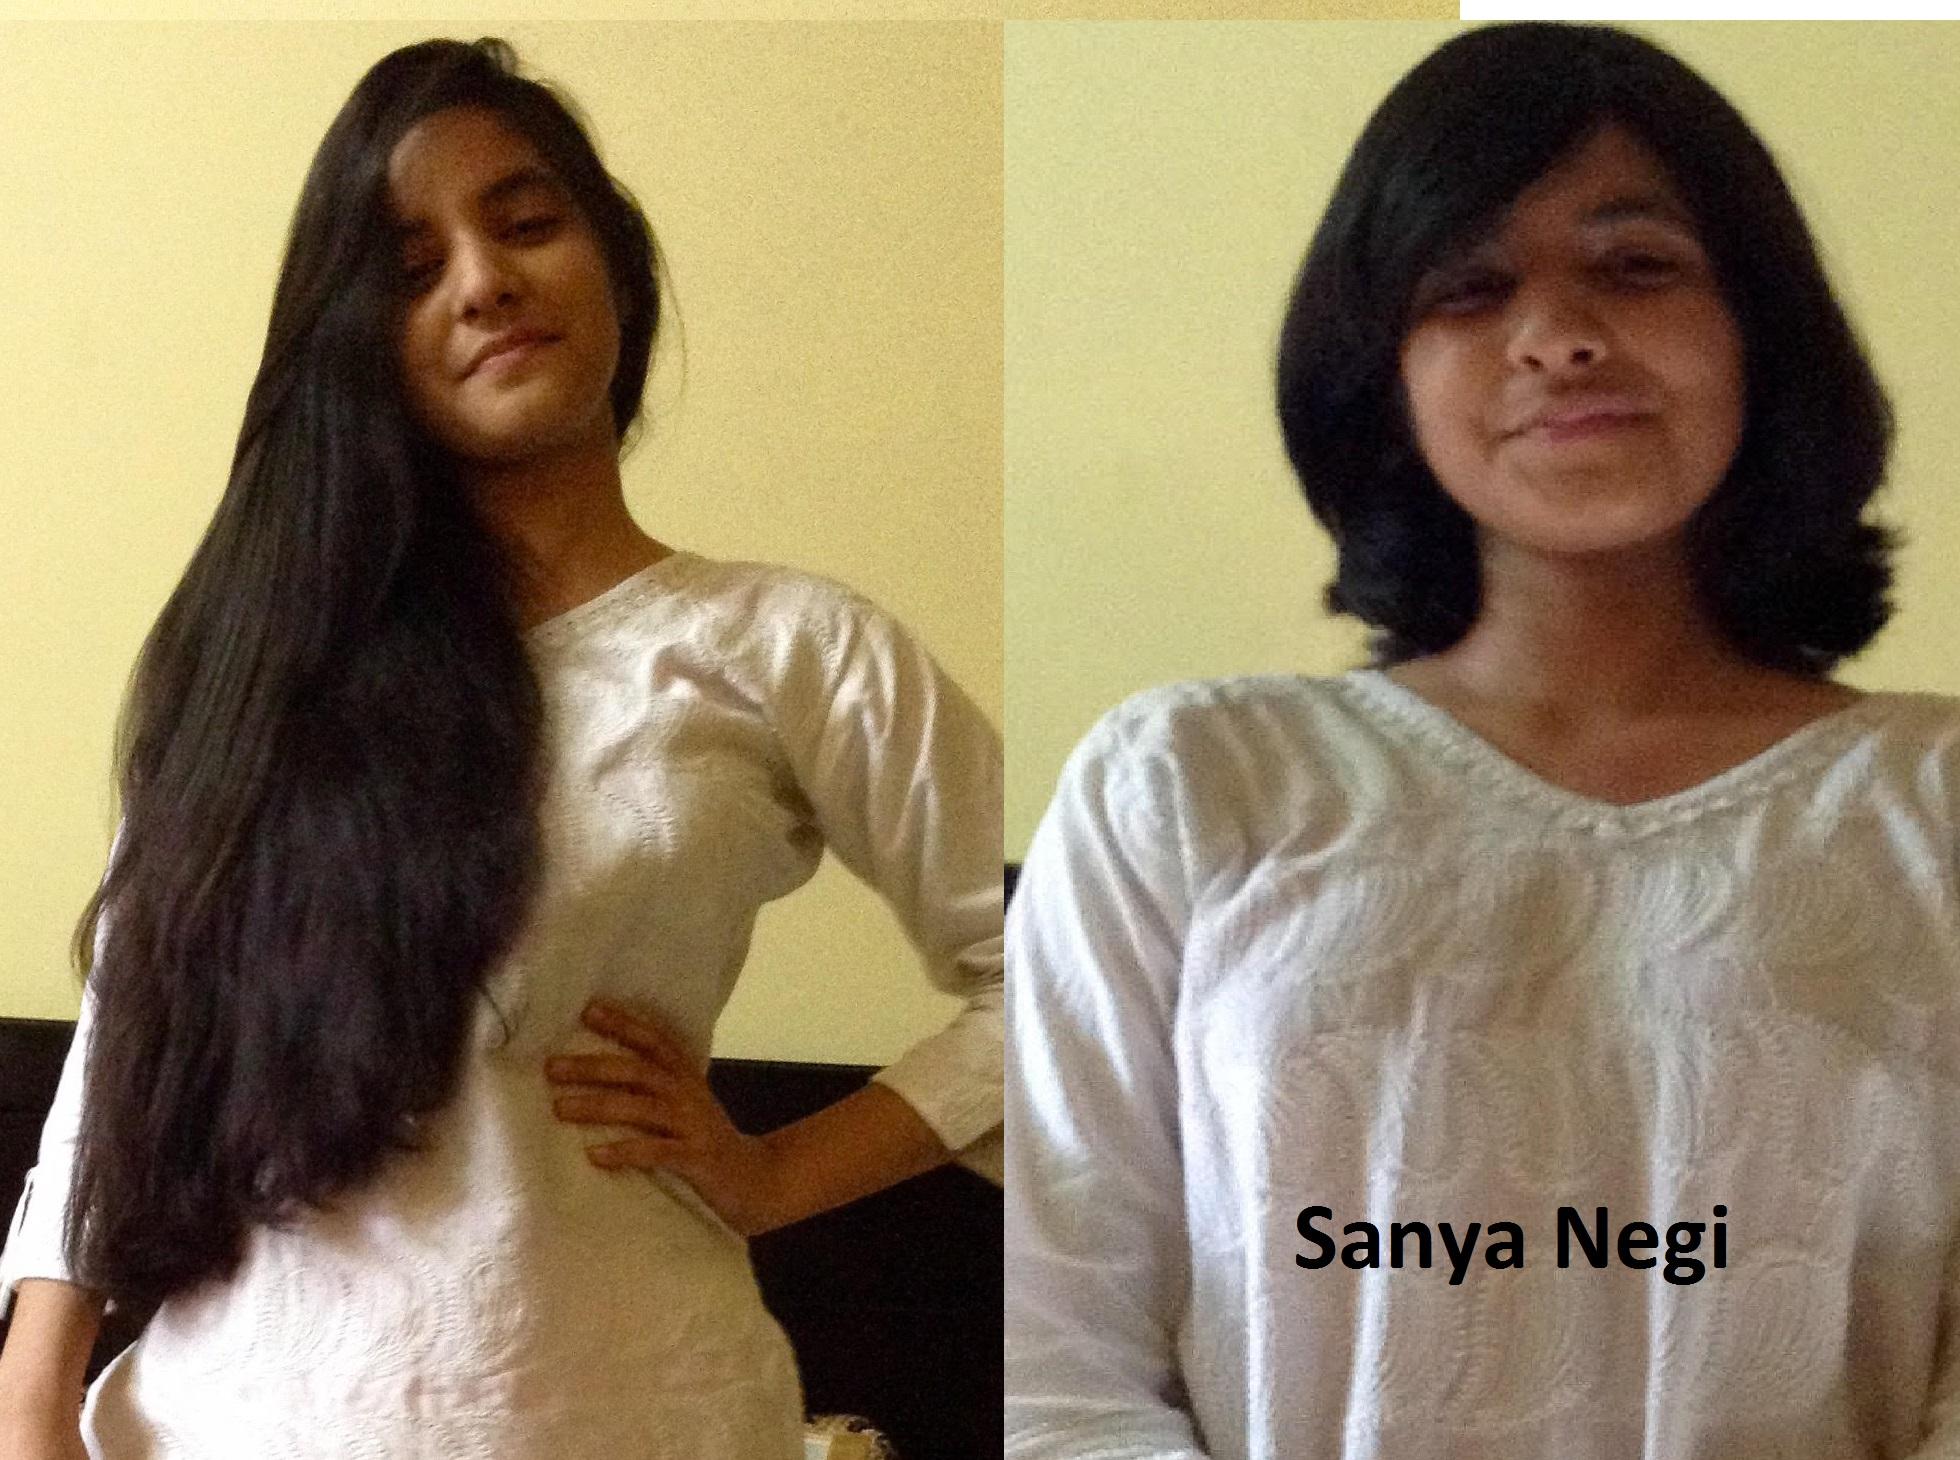 Sanya Negi